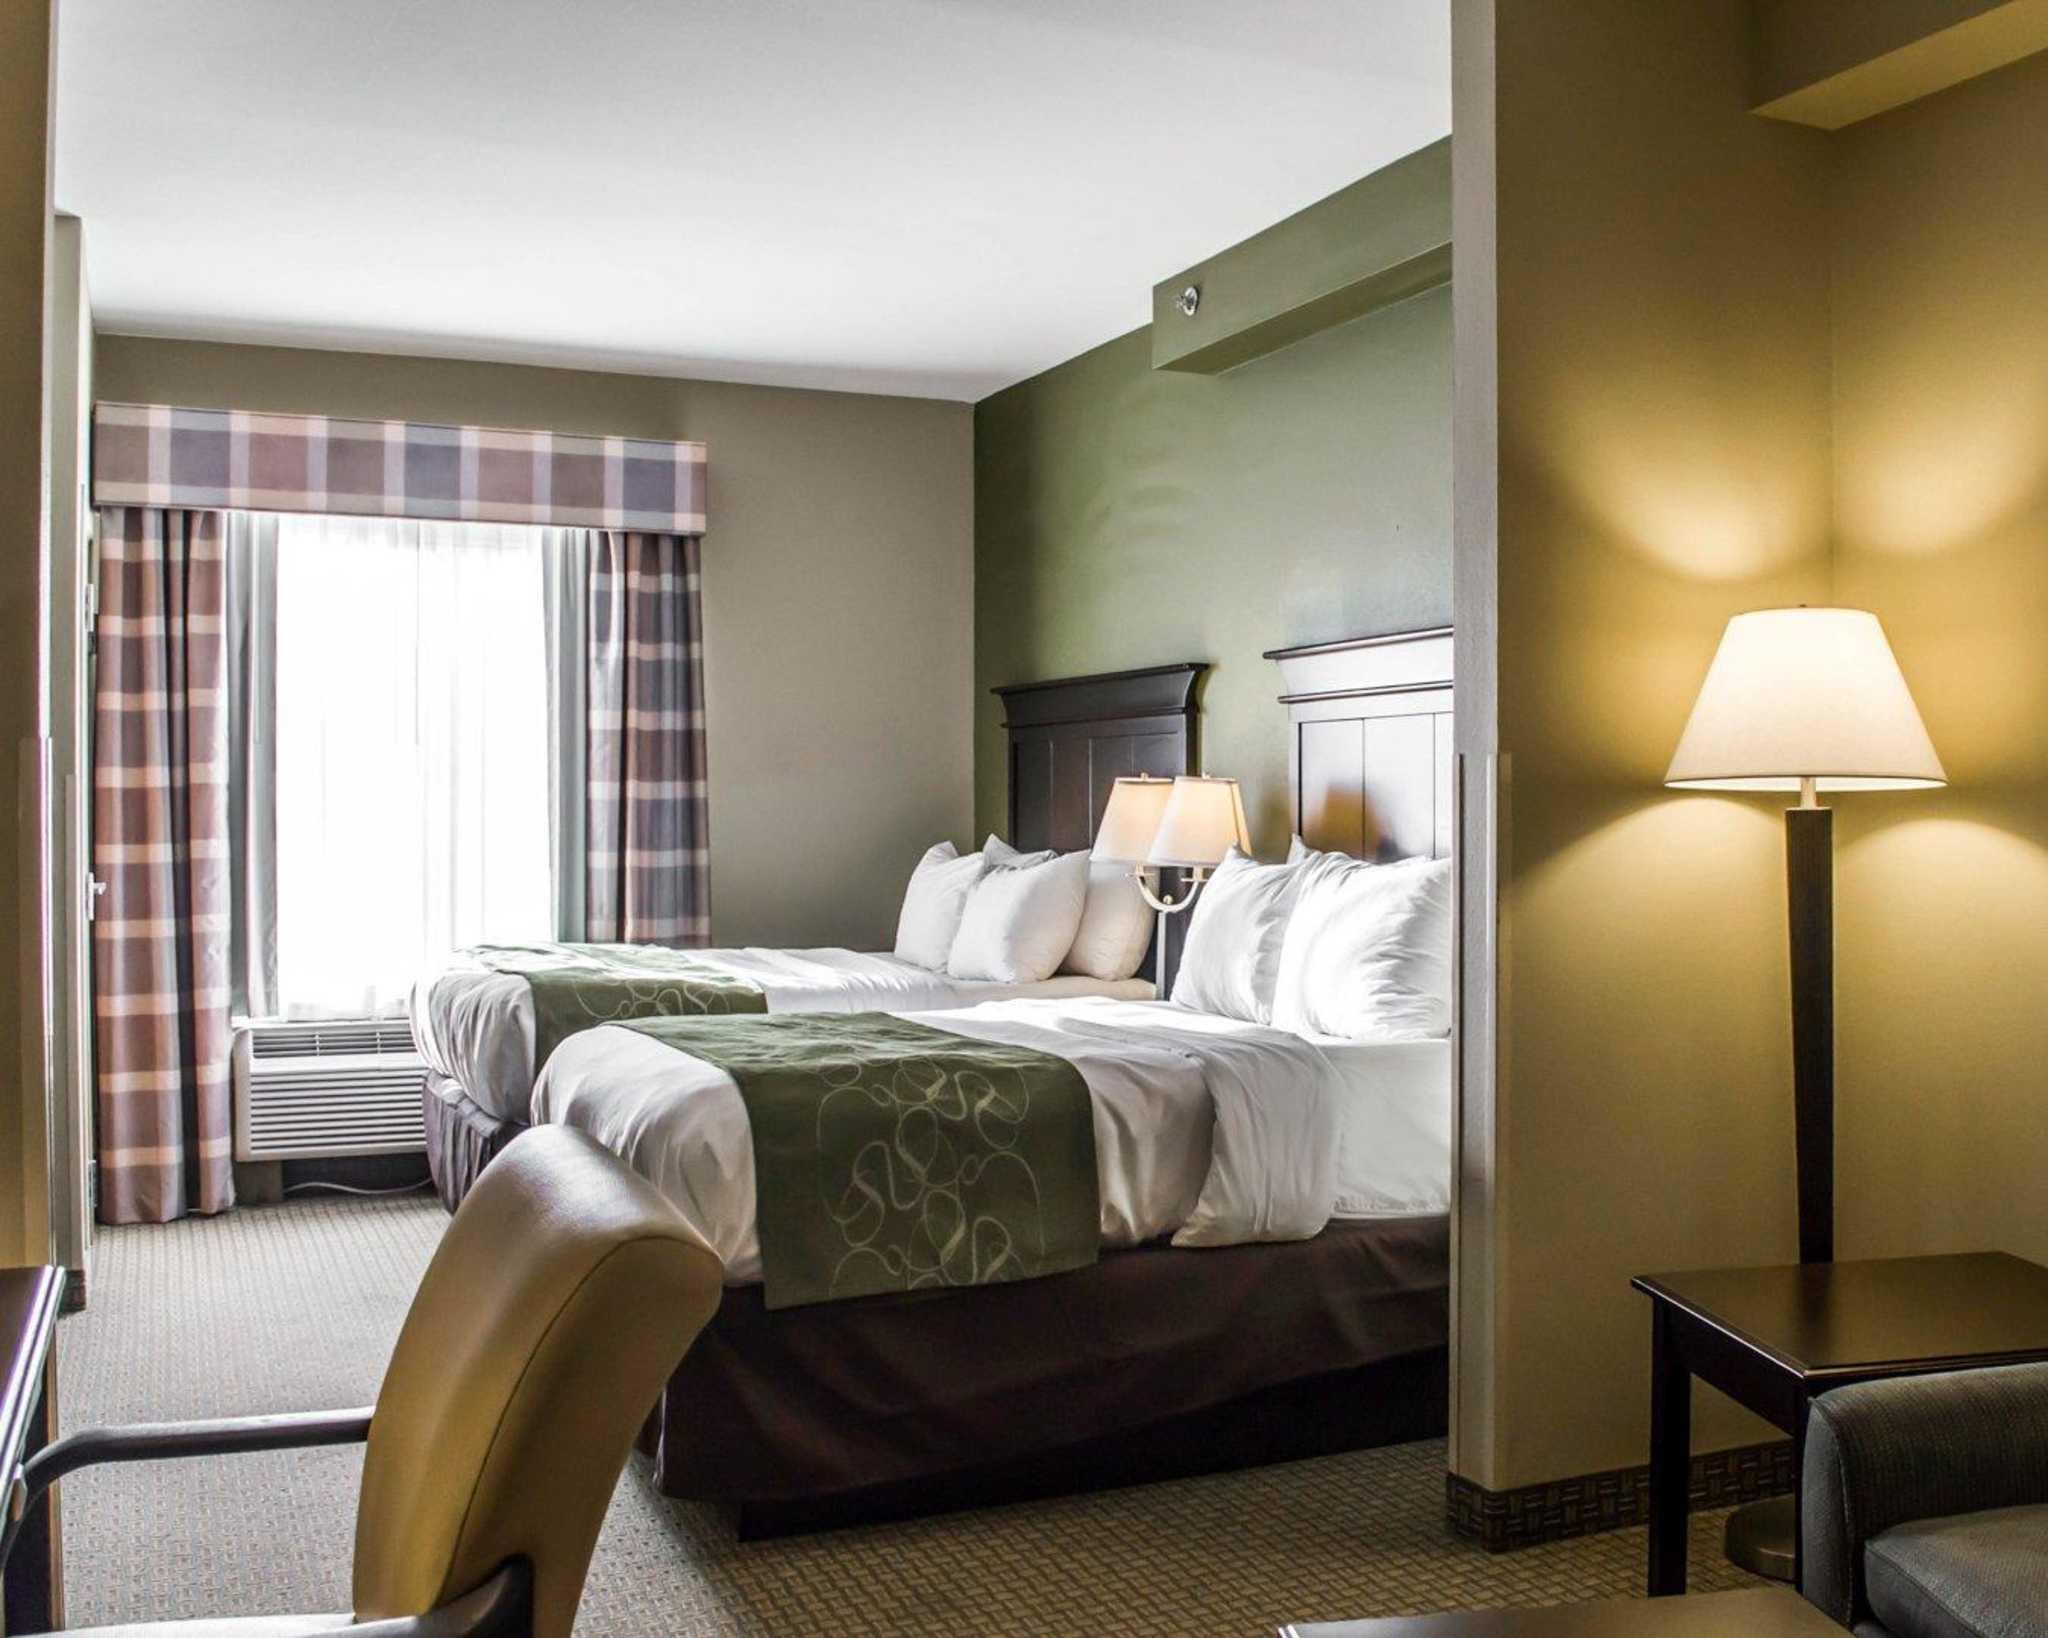 Comfort Suites Foley North Gulf Shores Foley Alabama